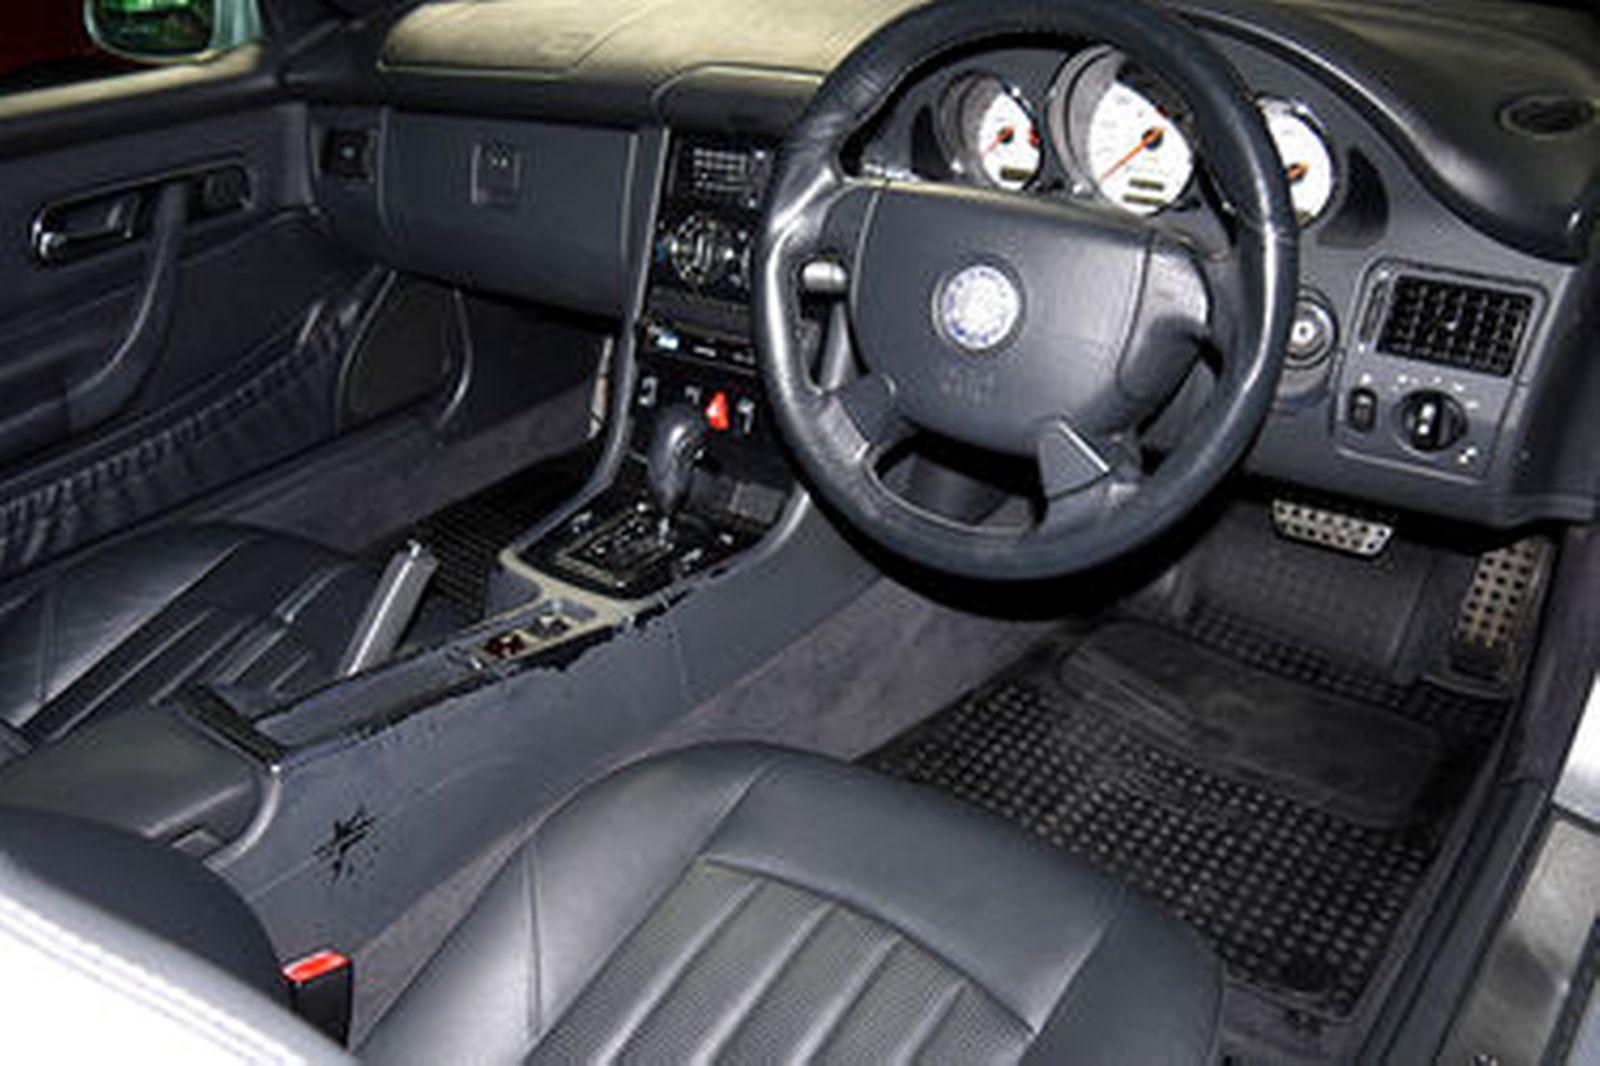 Mercedes-Benz SLK32 AMG Convertible